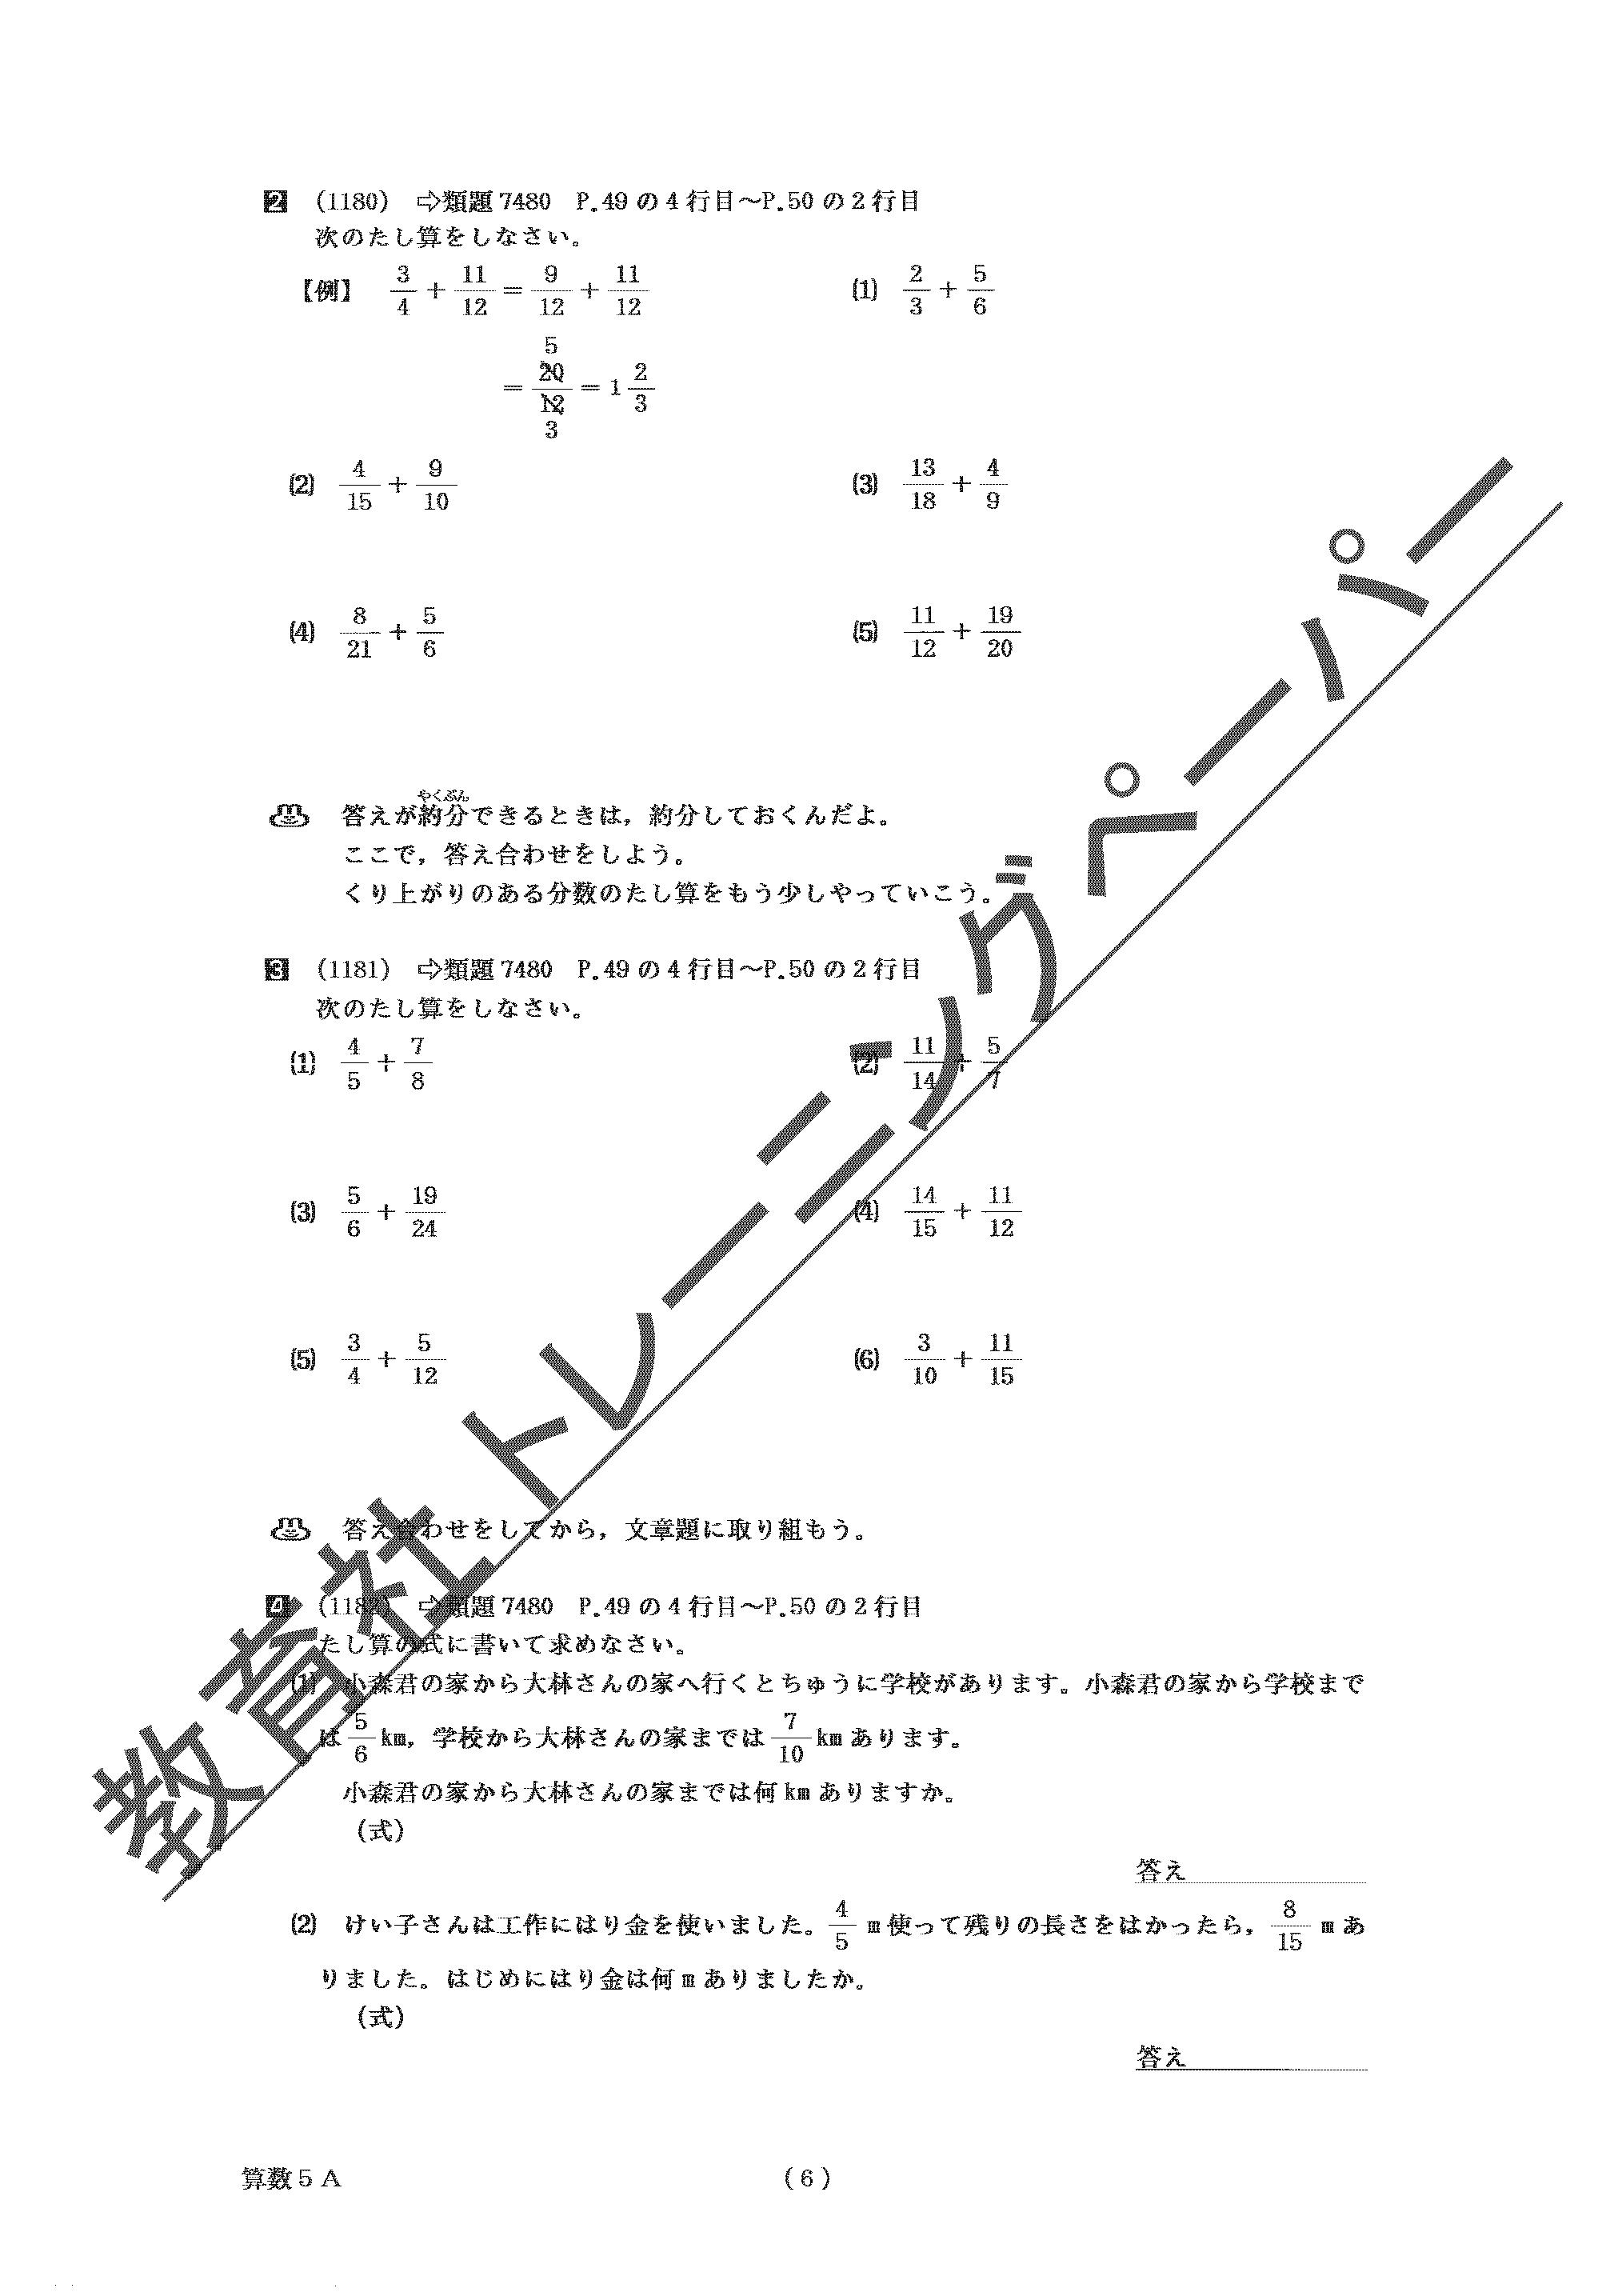 ITEM-S5SANSU-009